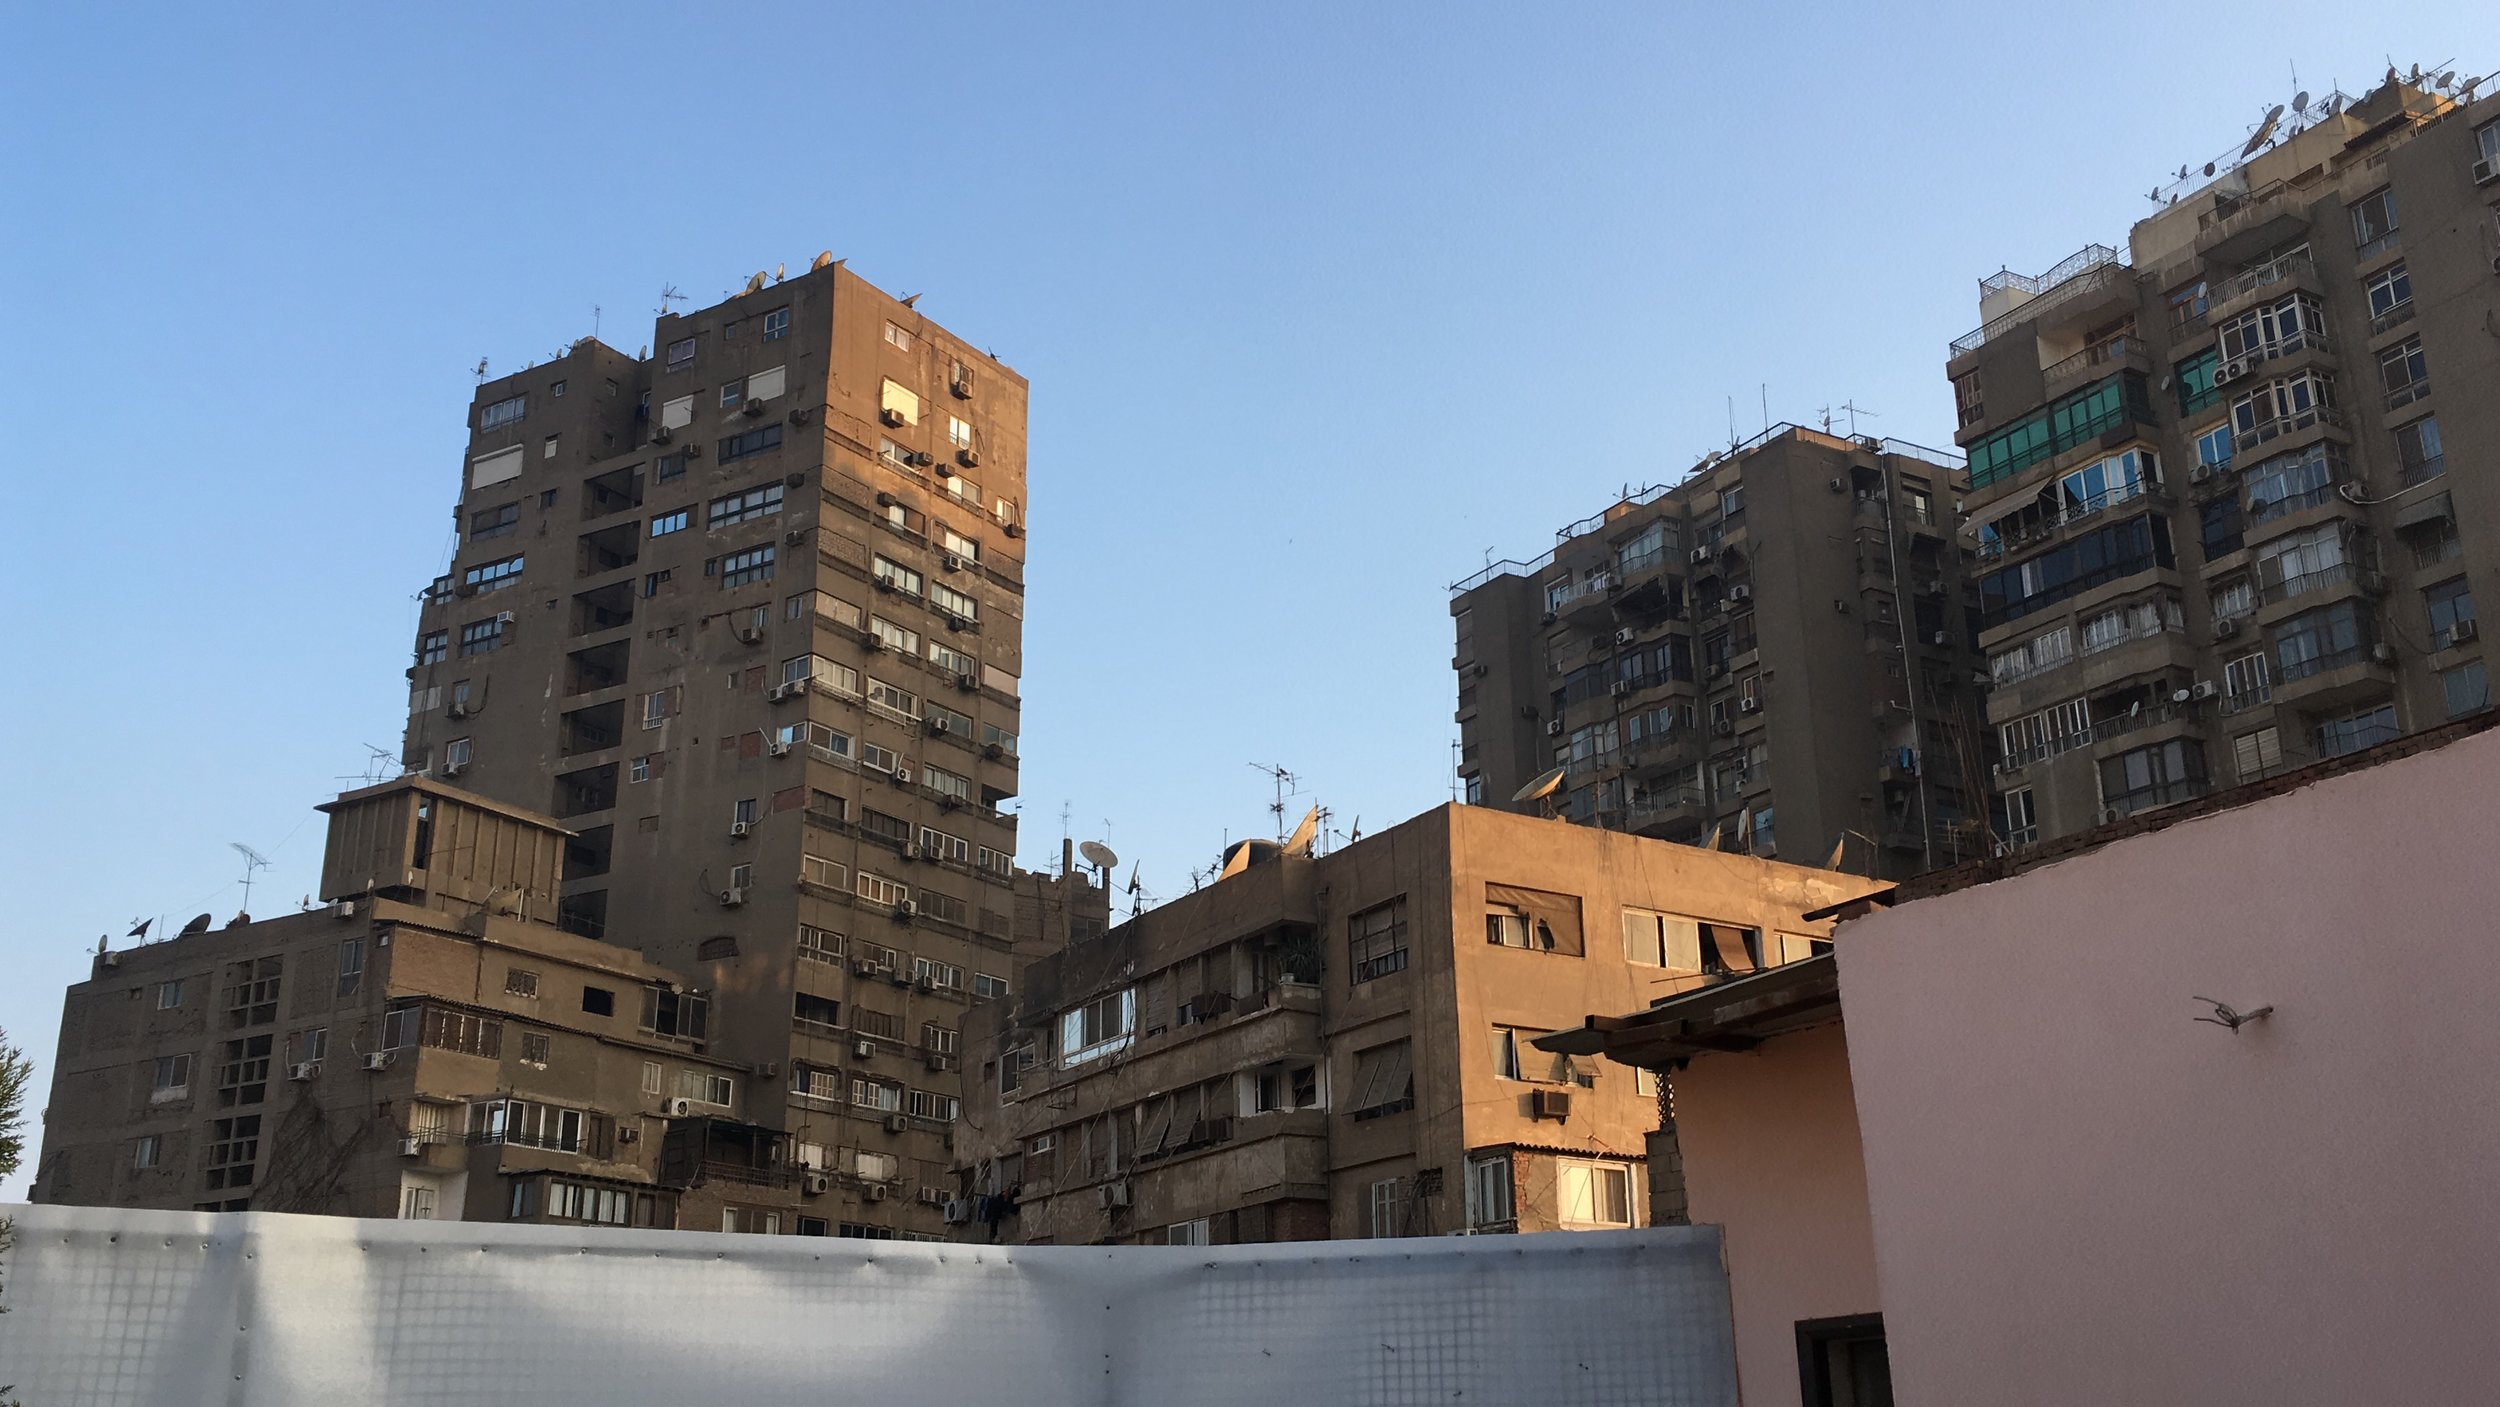 Zamalek-an affluent area-not so much in the way it looks (8).JPG